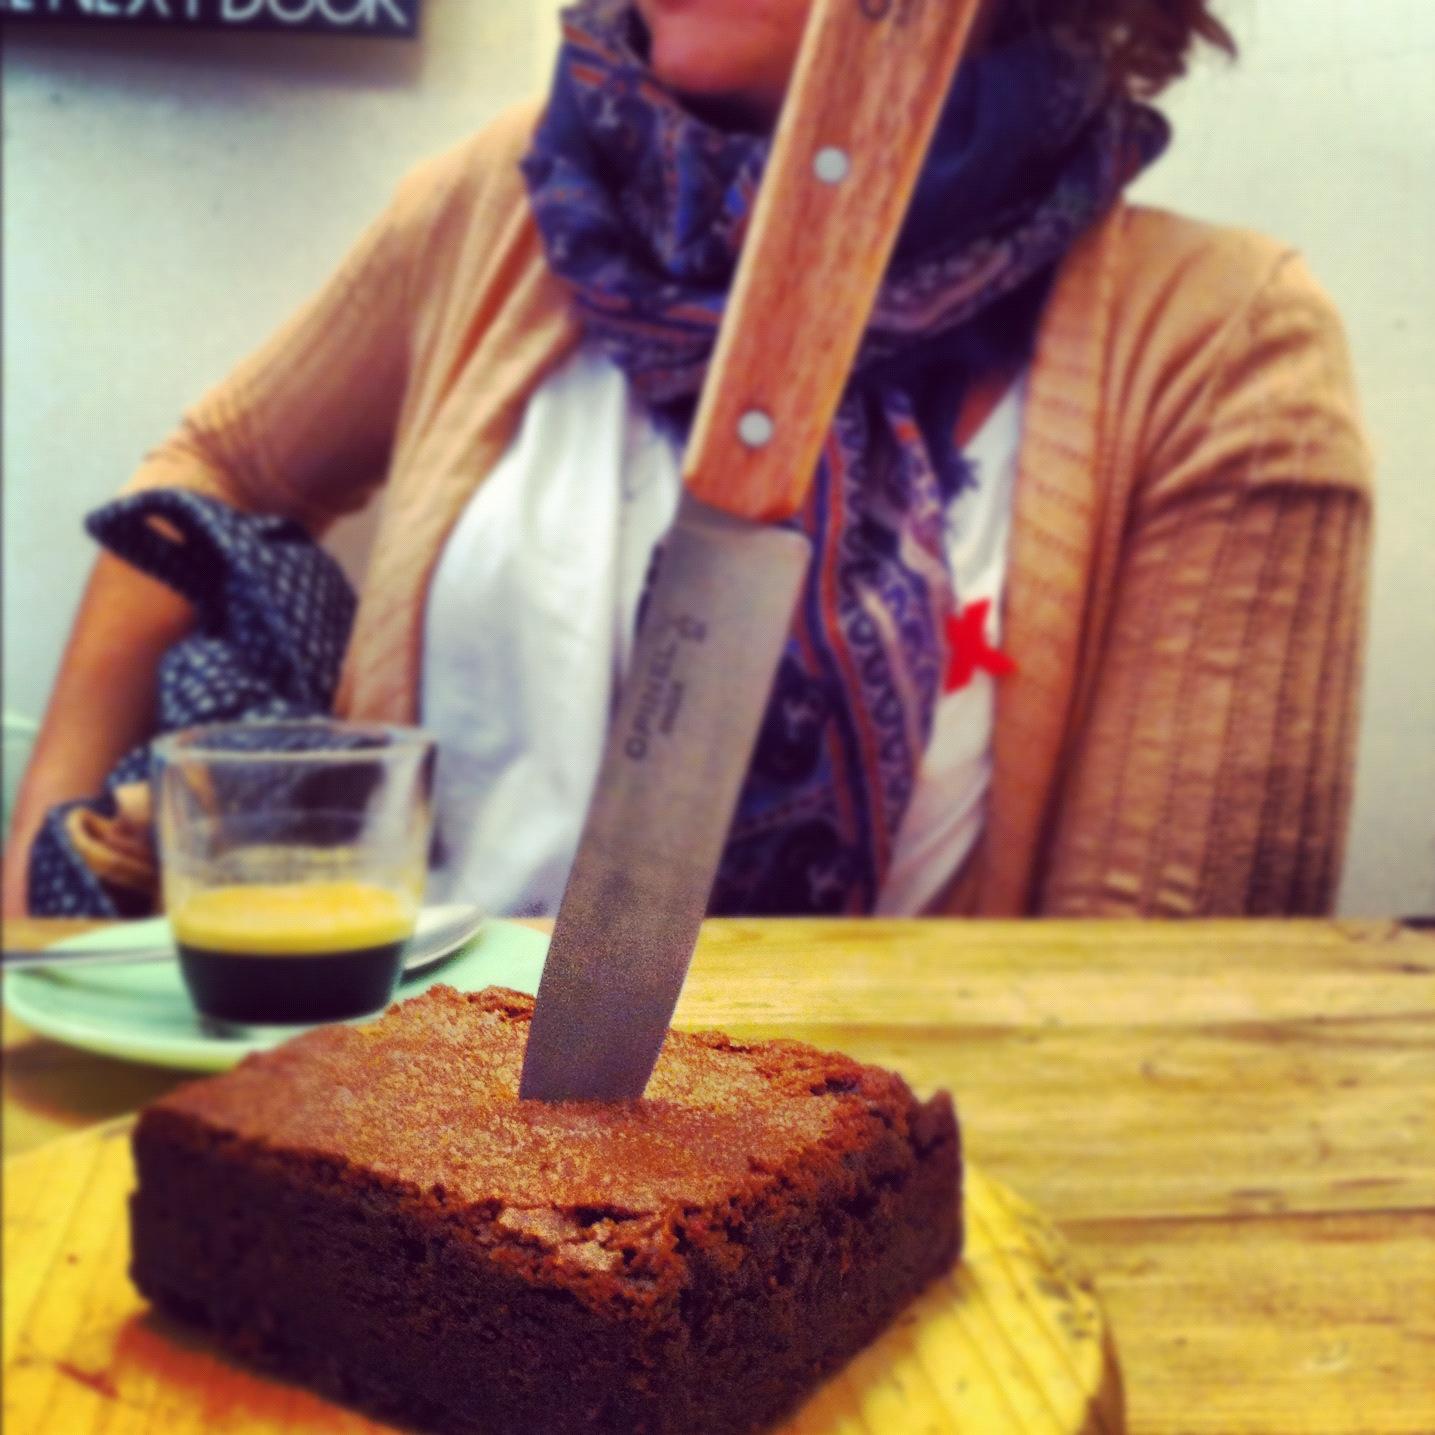 Killing a brownie